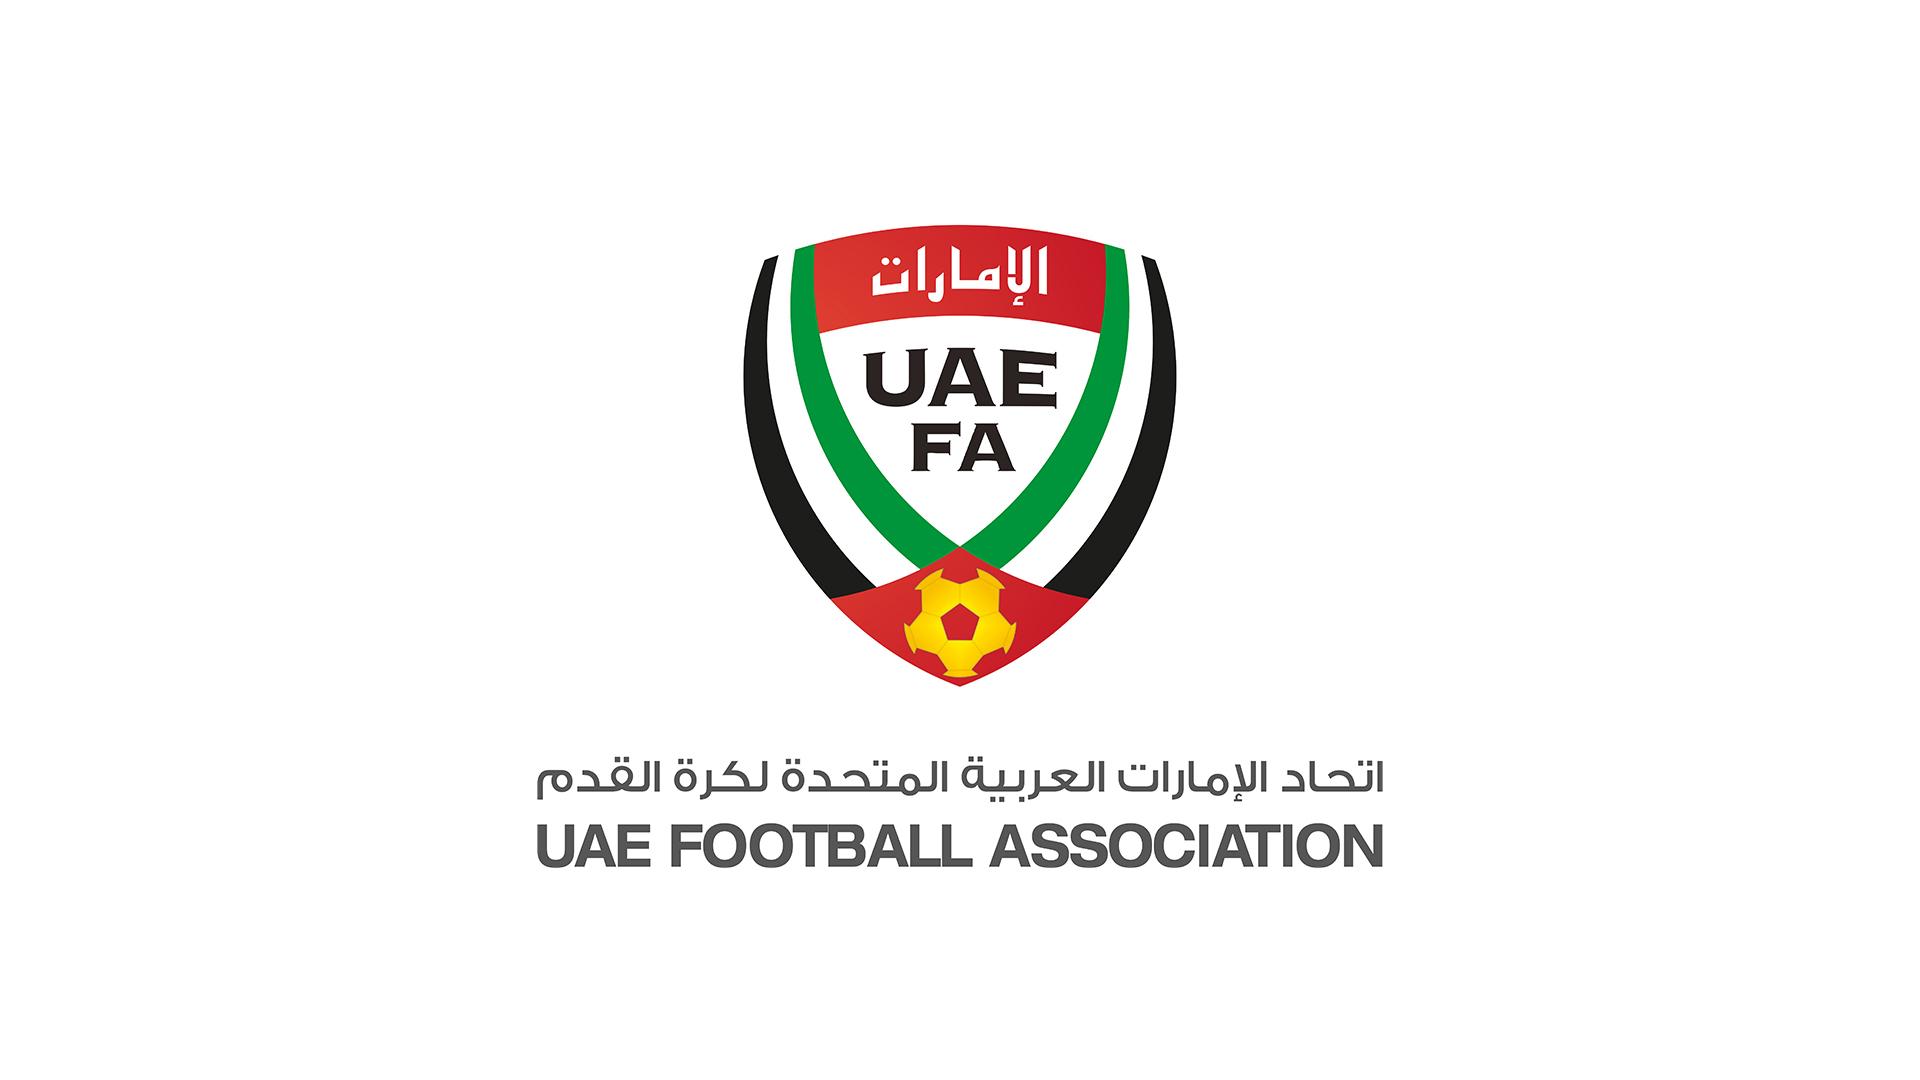 UAEFA